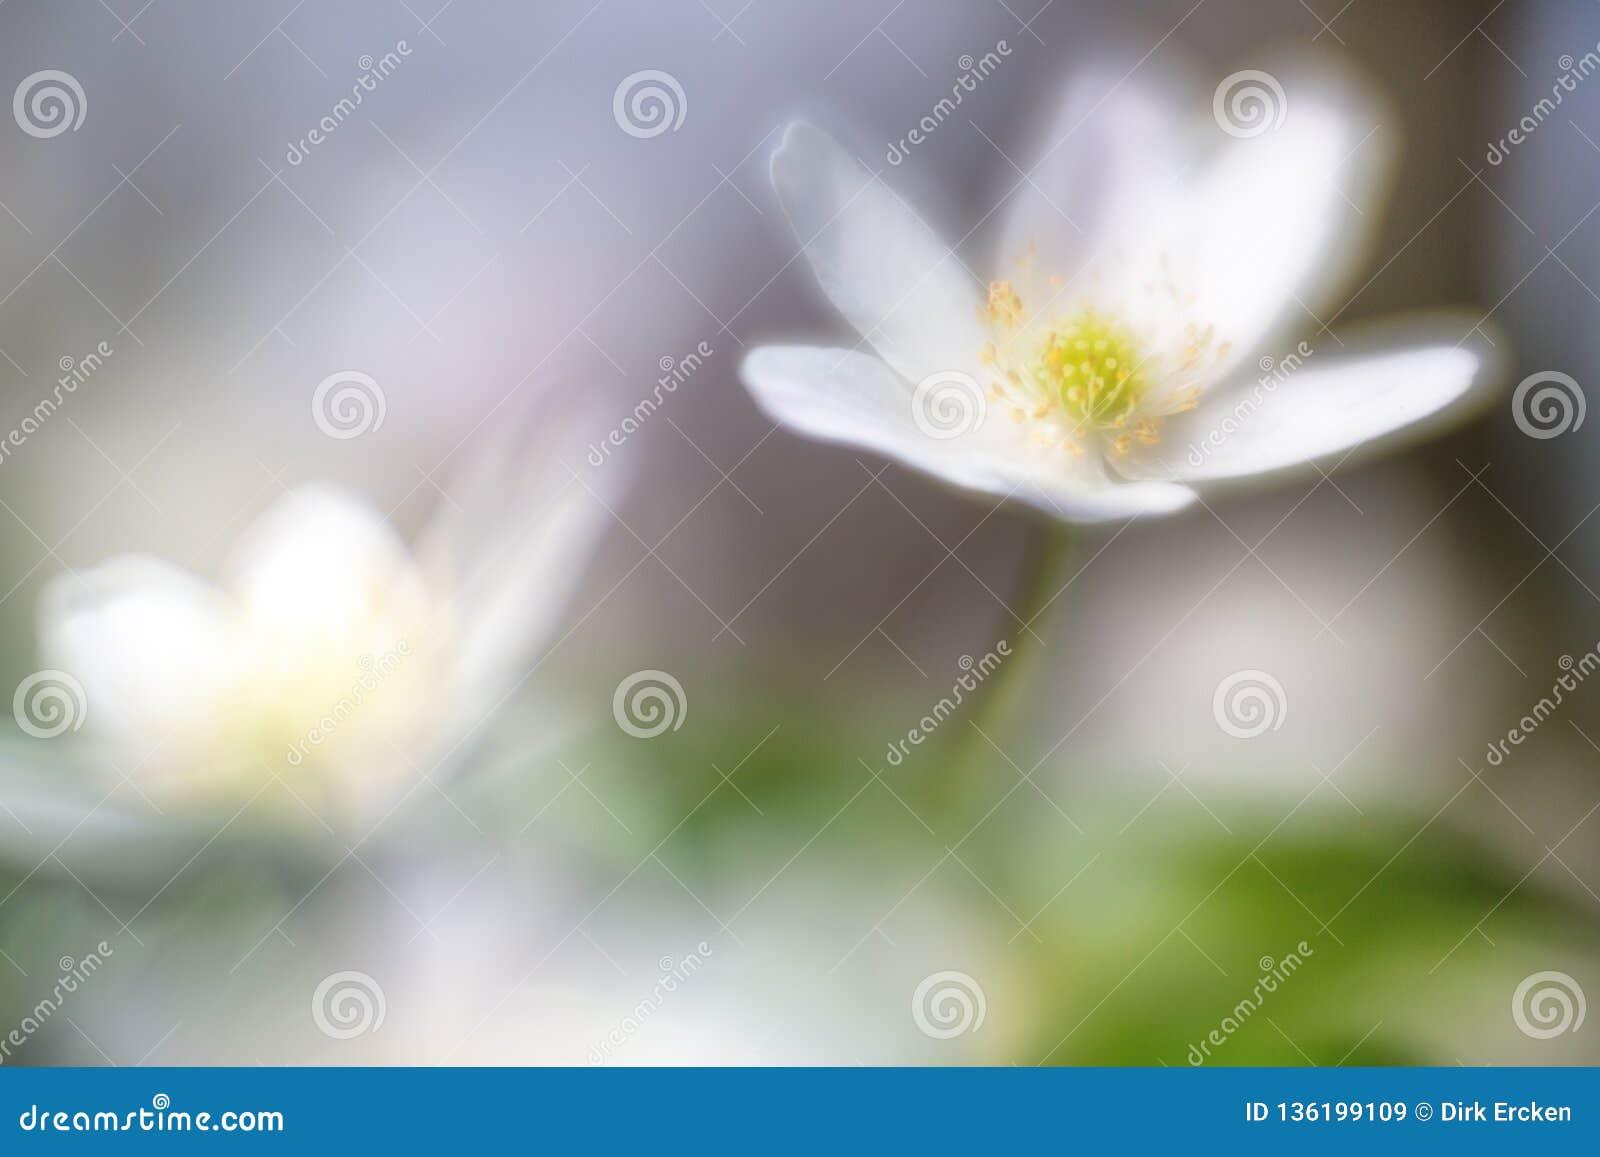 Dreamy wild wood anemone in soft focus